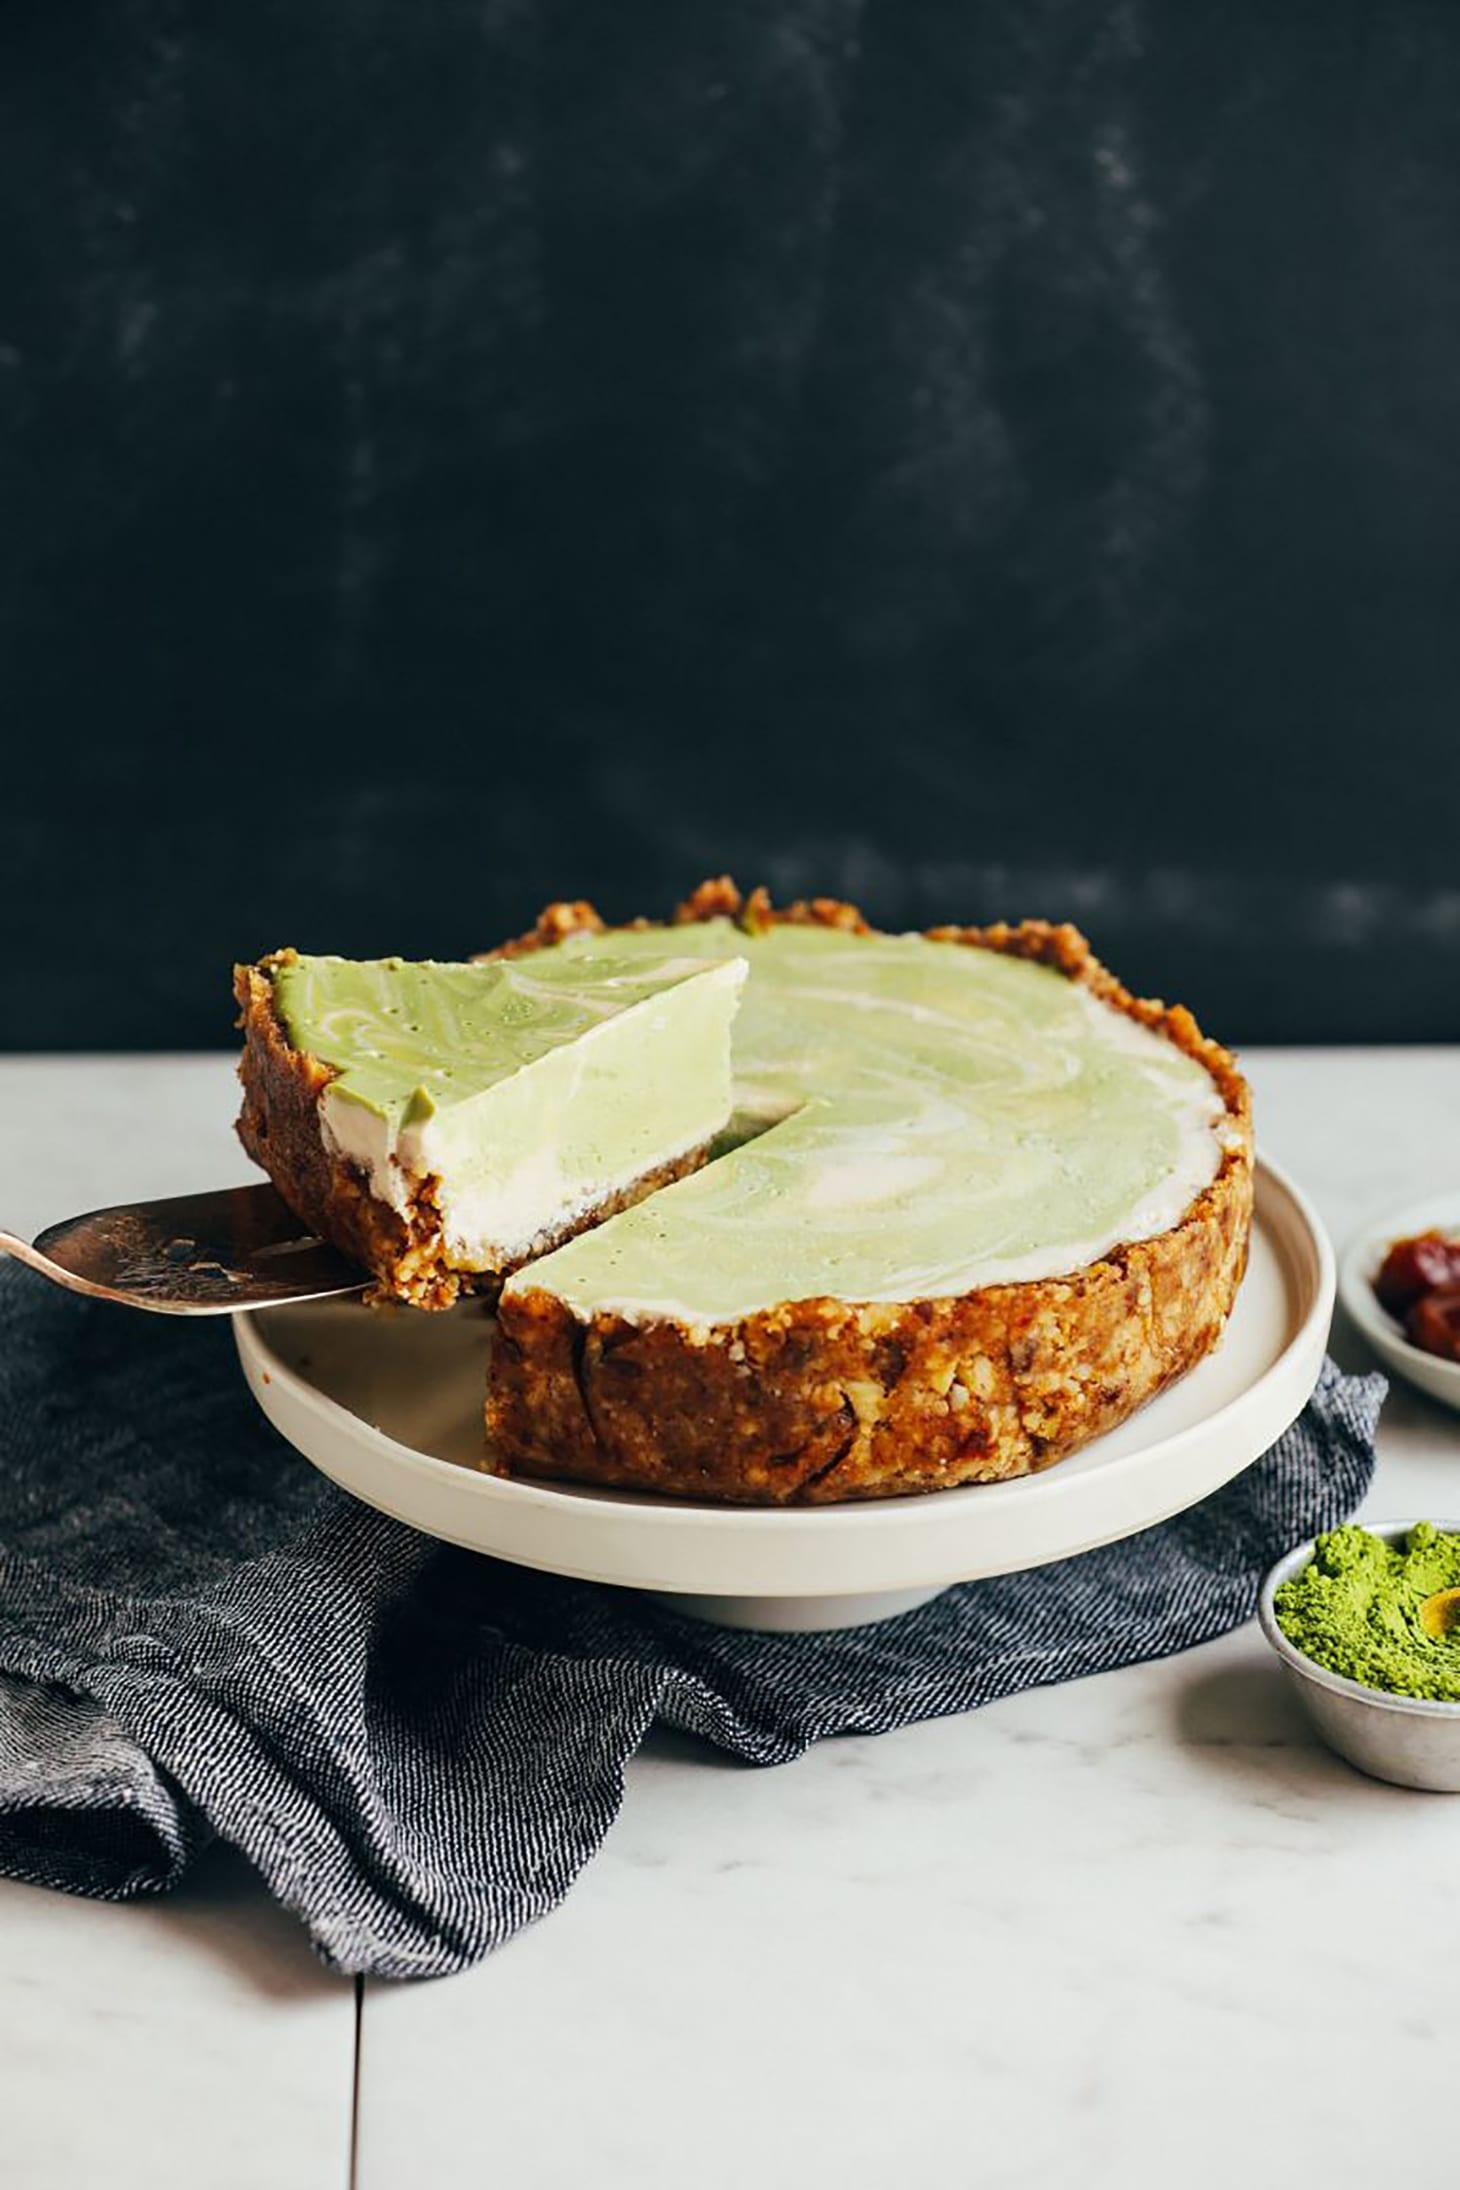 Vegan Matcha Swirl Cheesecake by Minimalist Baker